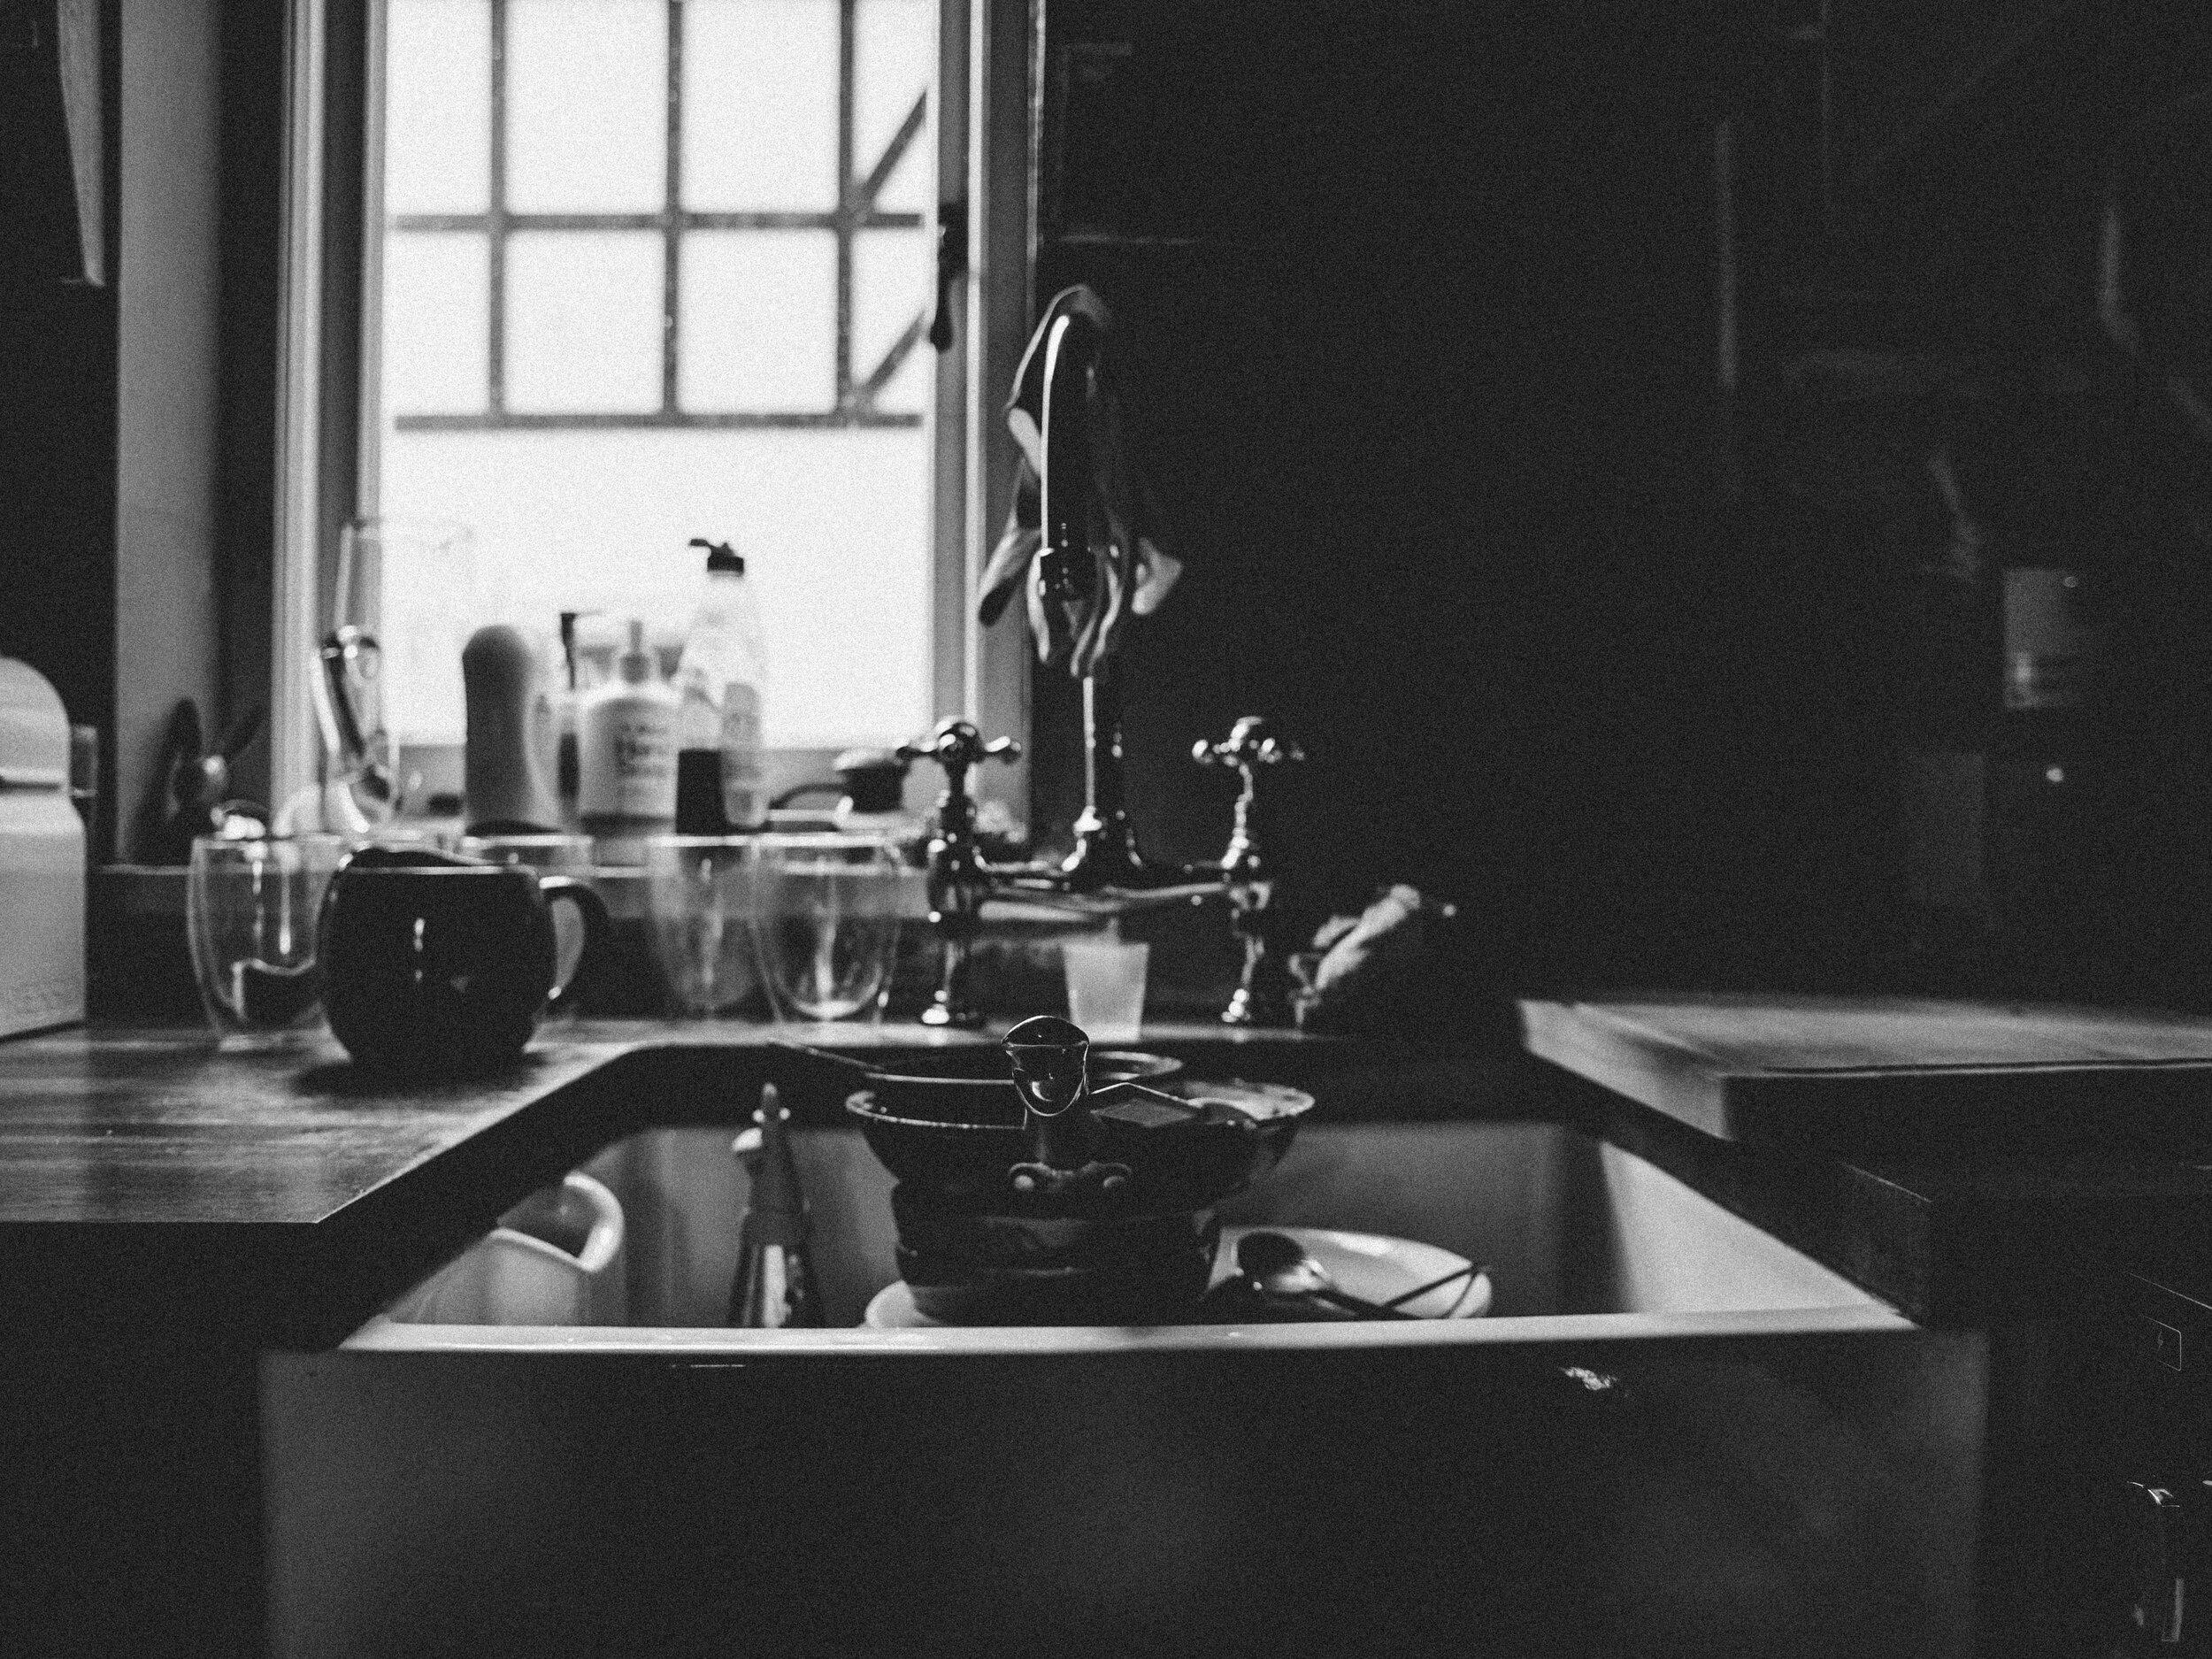 counter-dirty-faucet-1924815.jpg